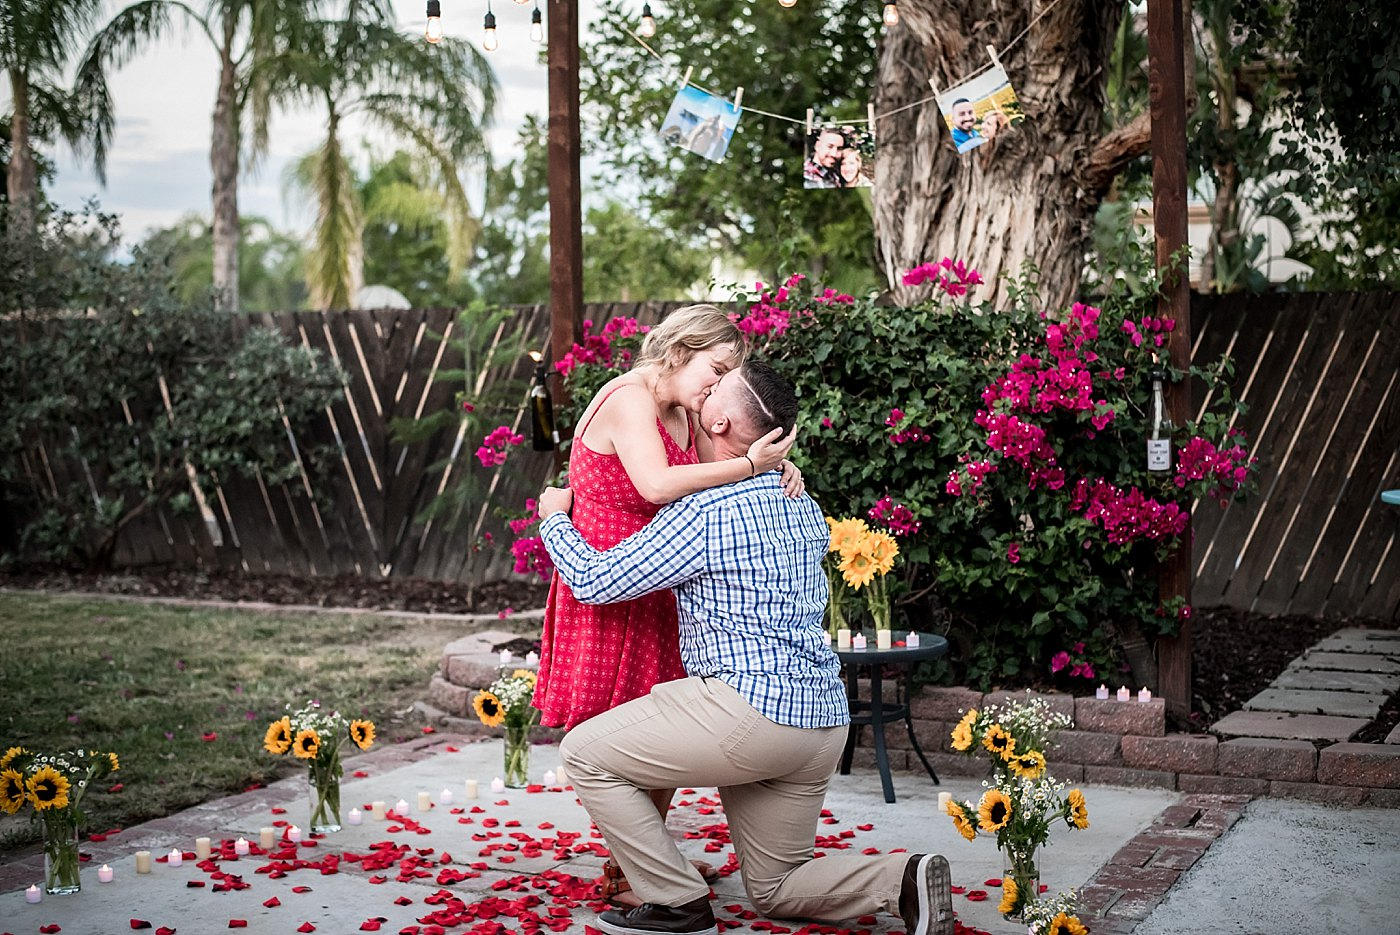 man and woman kiss after backyard proposal redlands family photographer